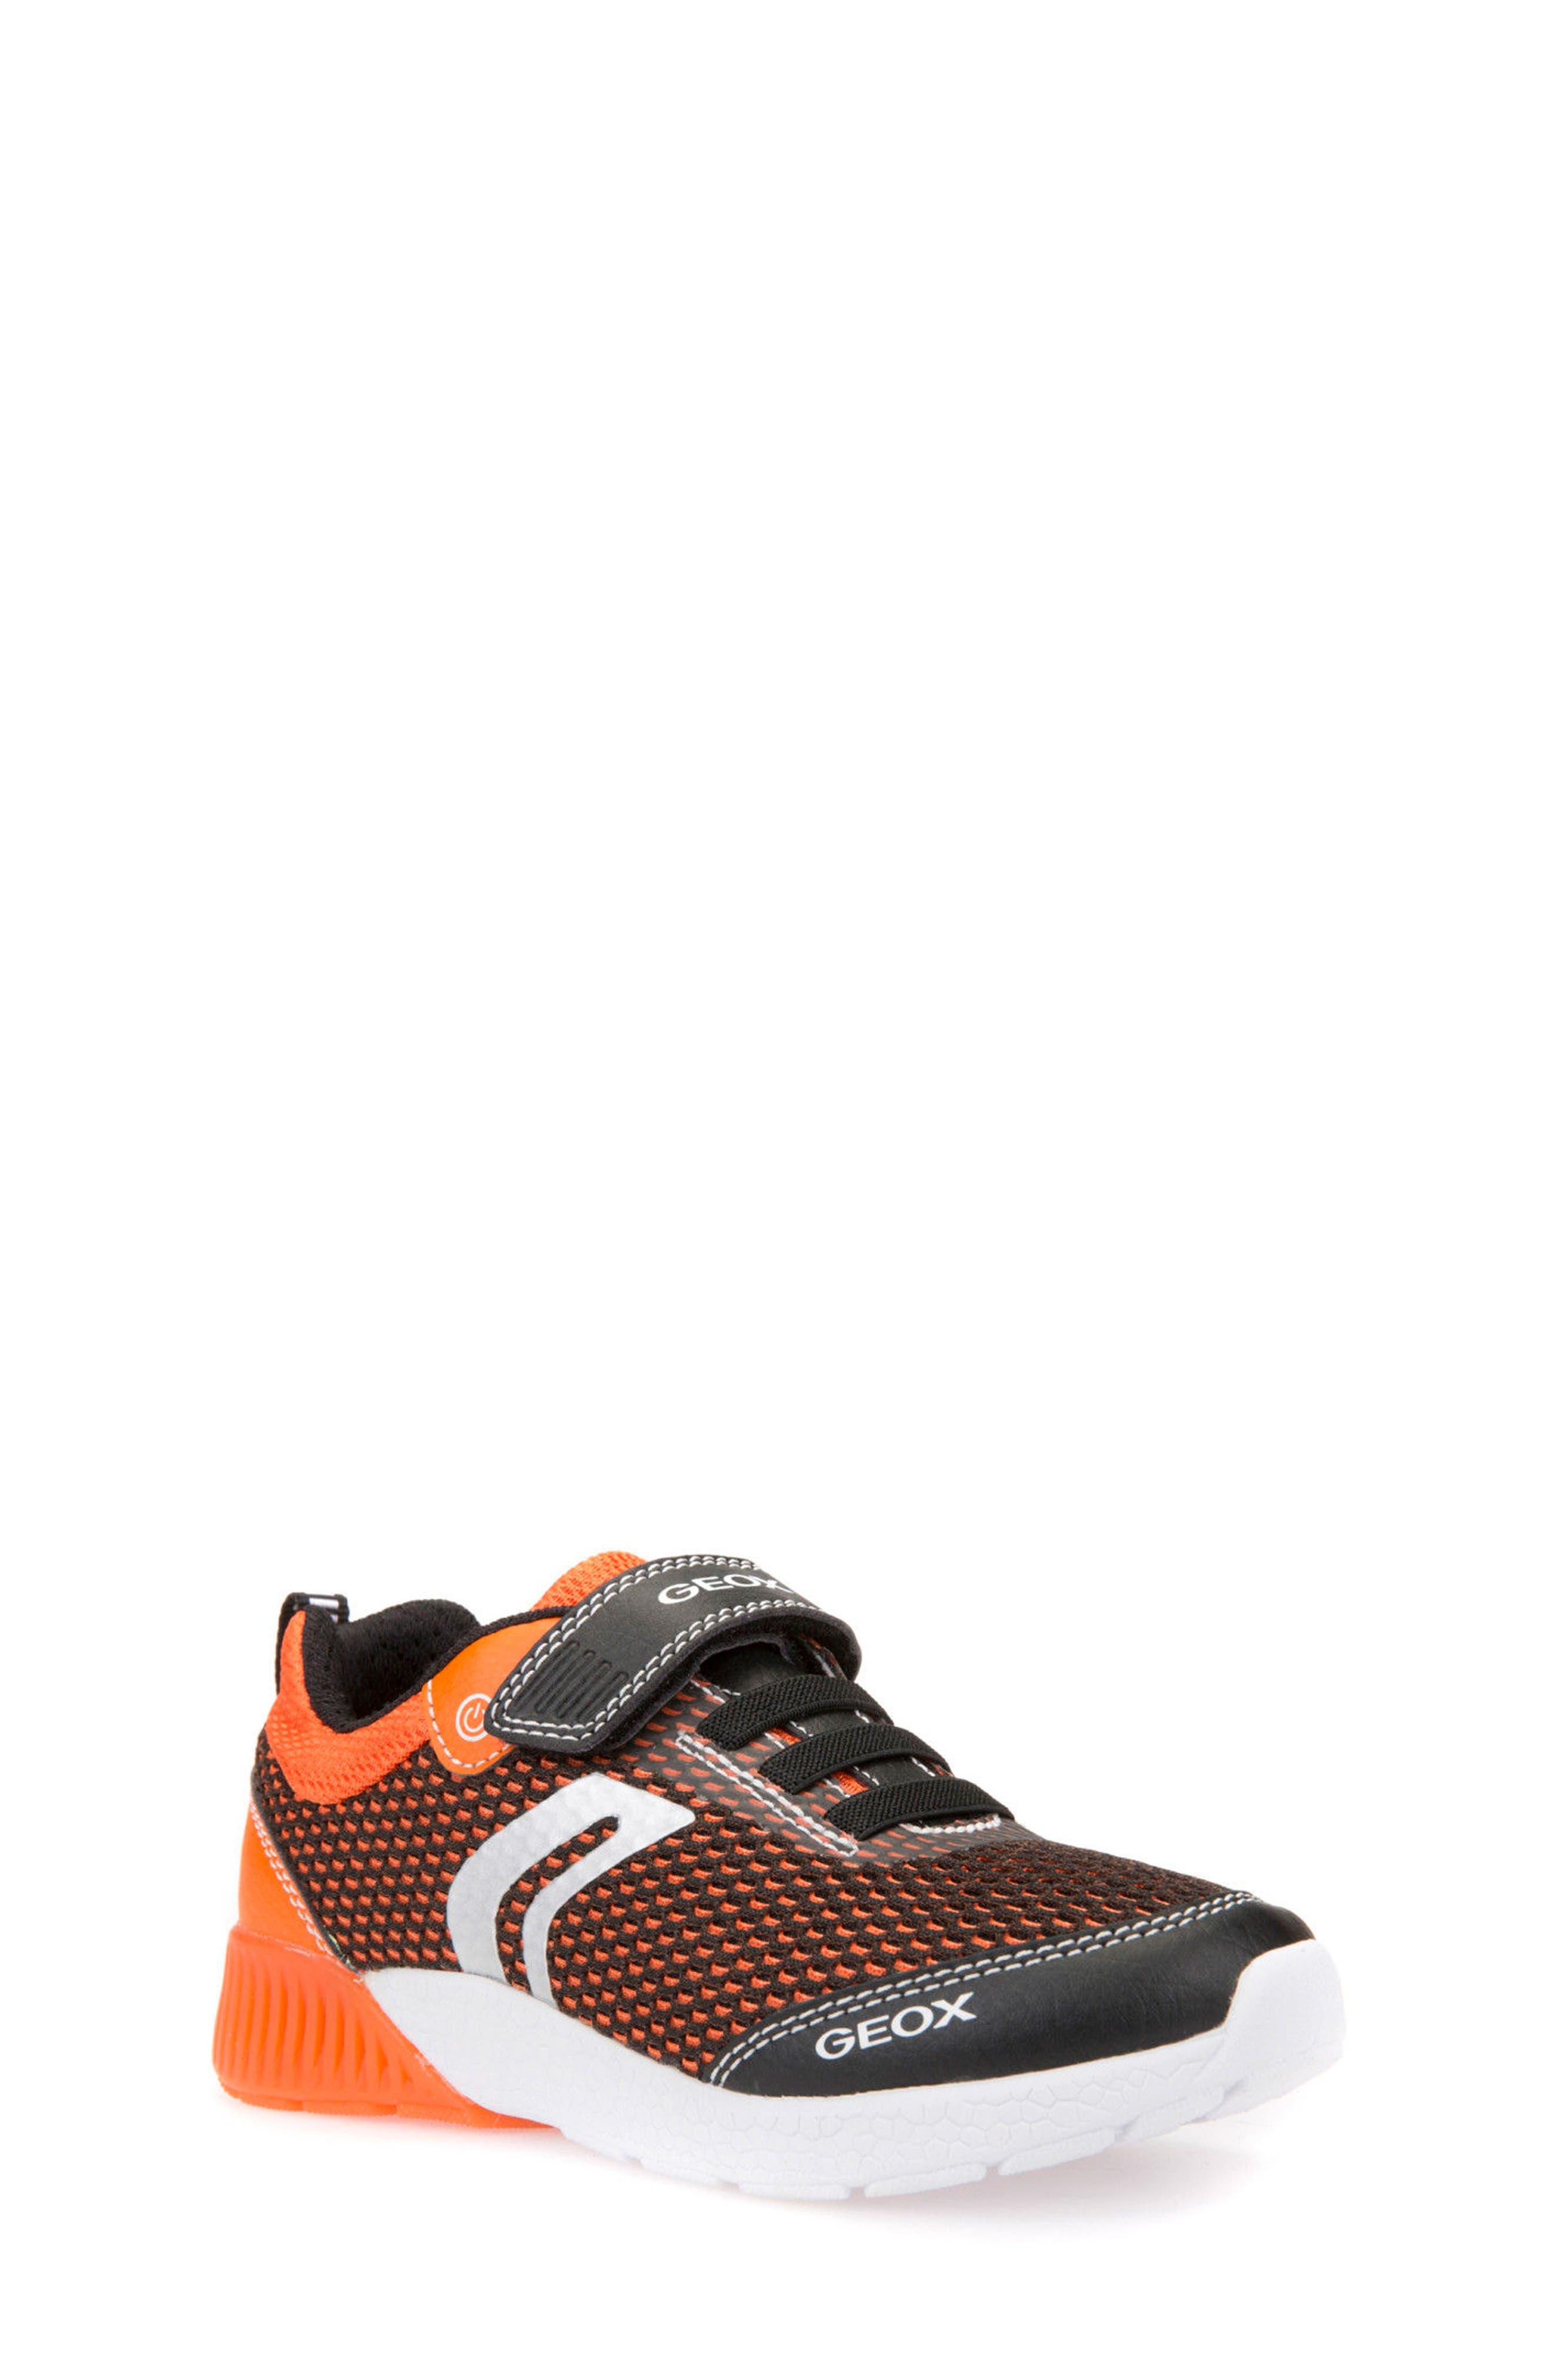 Sveth Light-Up Sneaker,                             Main thumbnail 1, color,                             BLACK/ ORANGE